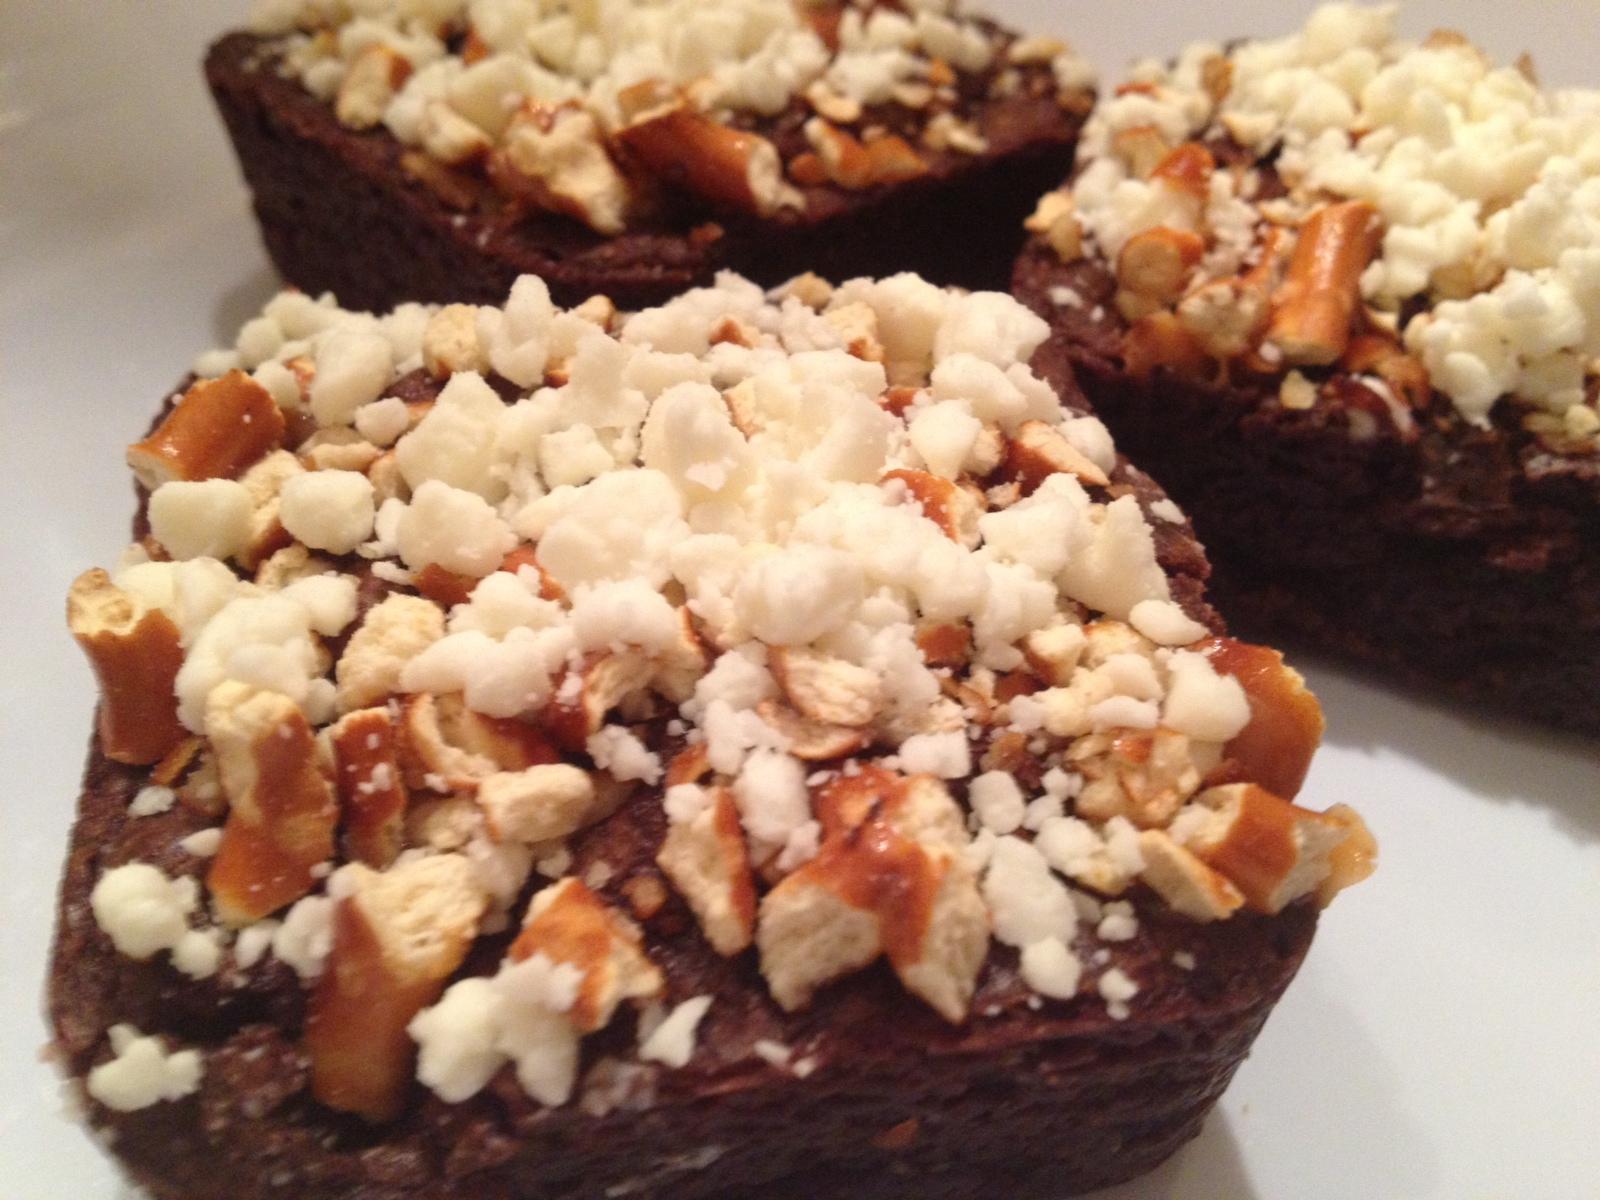 HG's Caramel & Pretzel Brownie